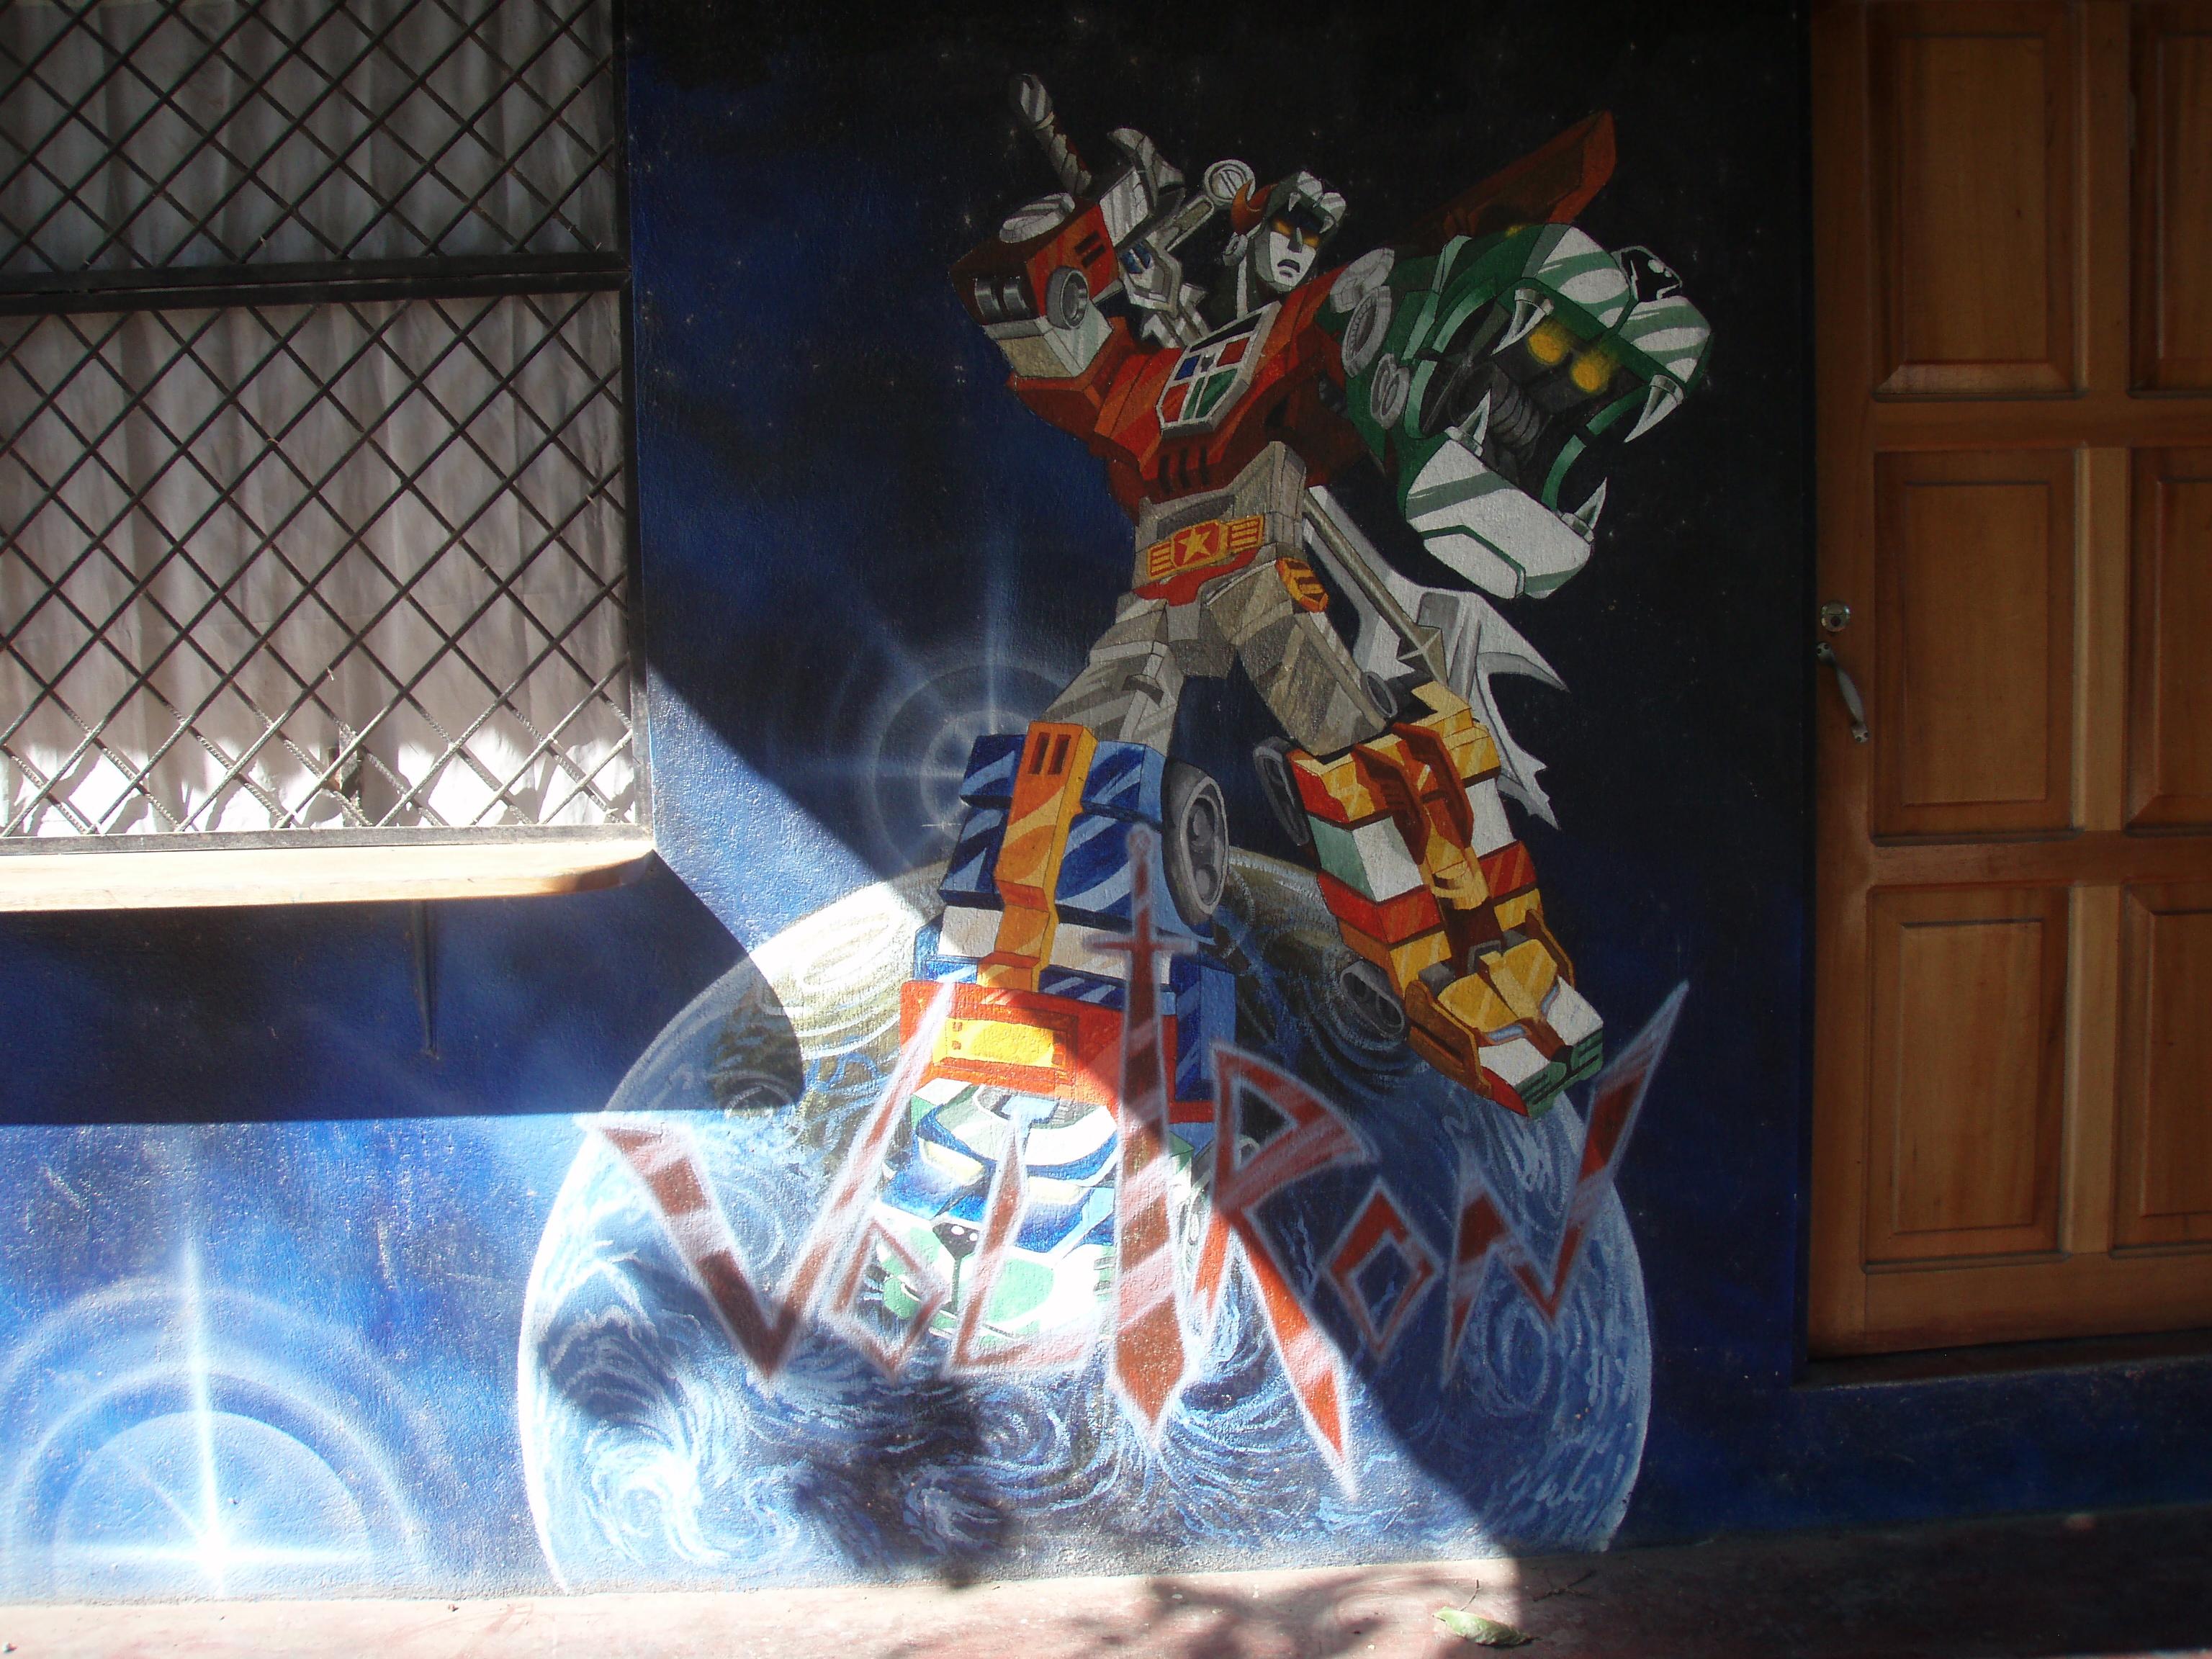 voltron street art - Puerto Jimenez, Costa Rica